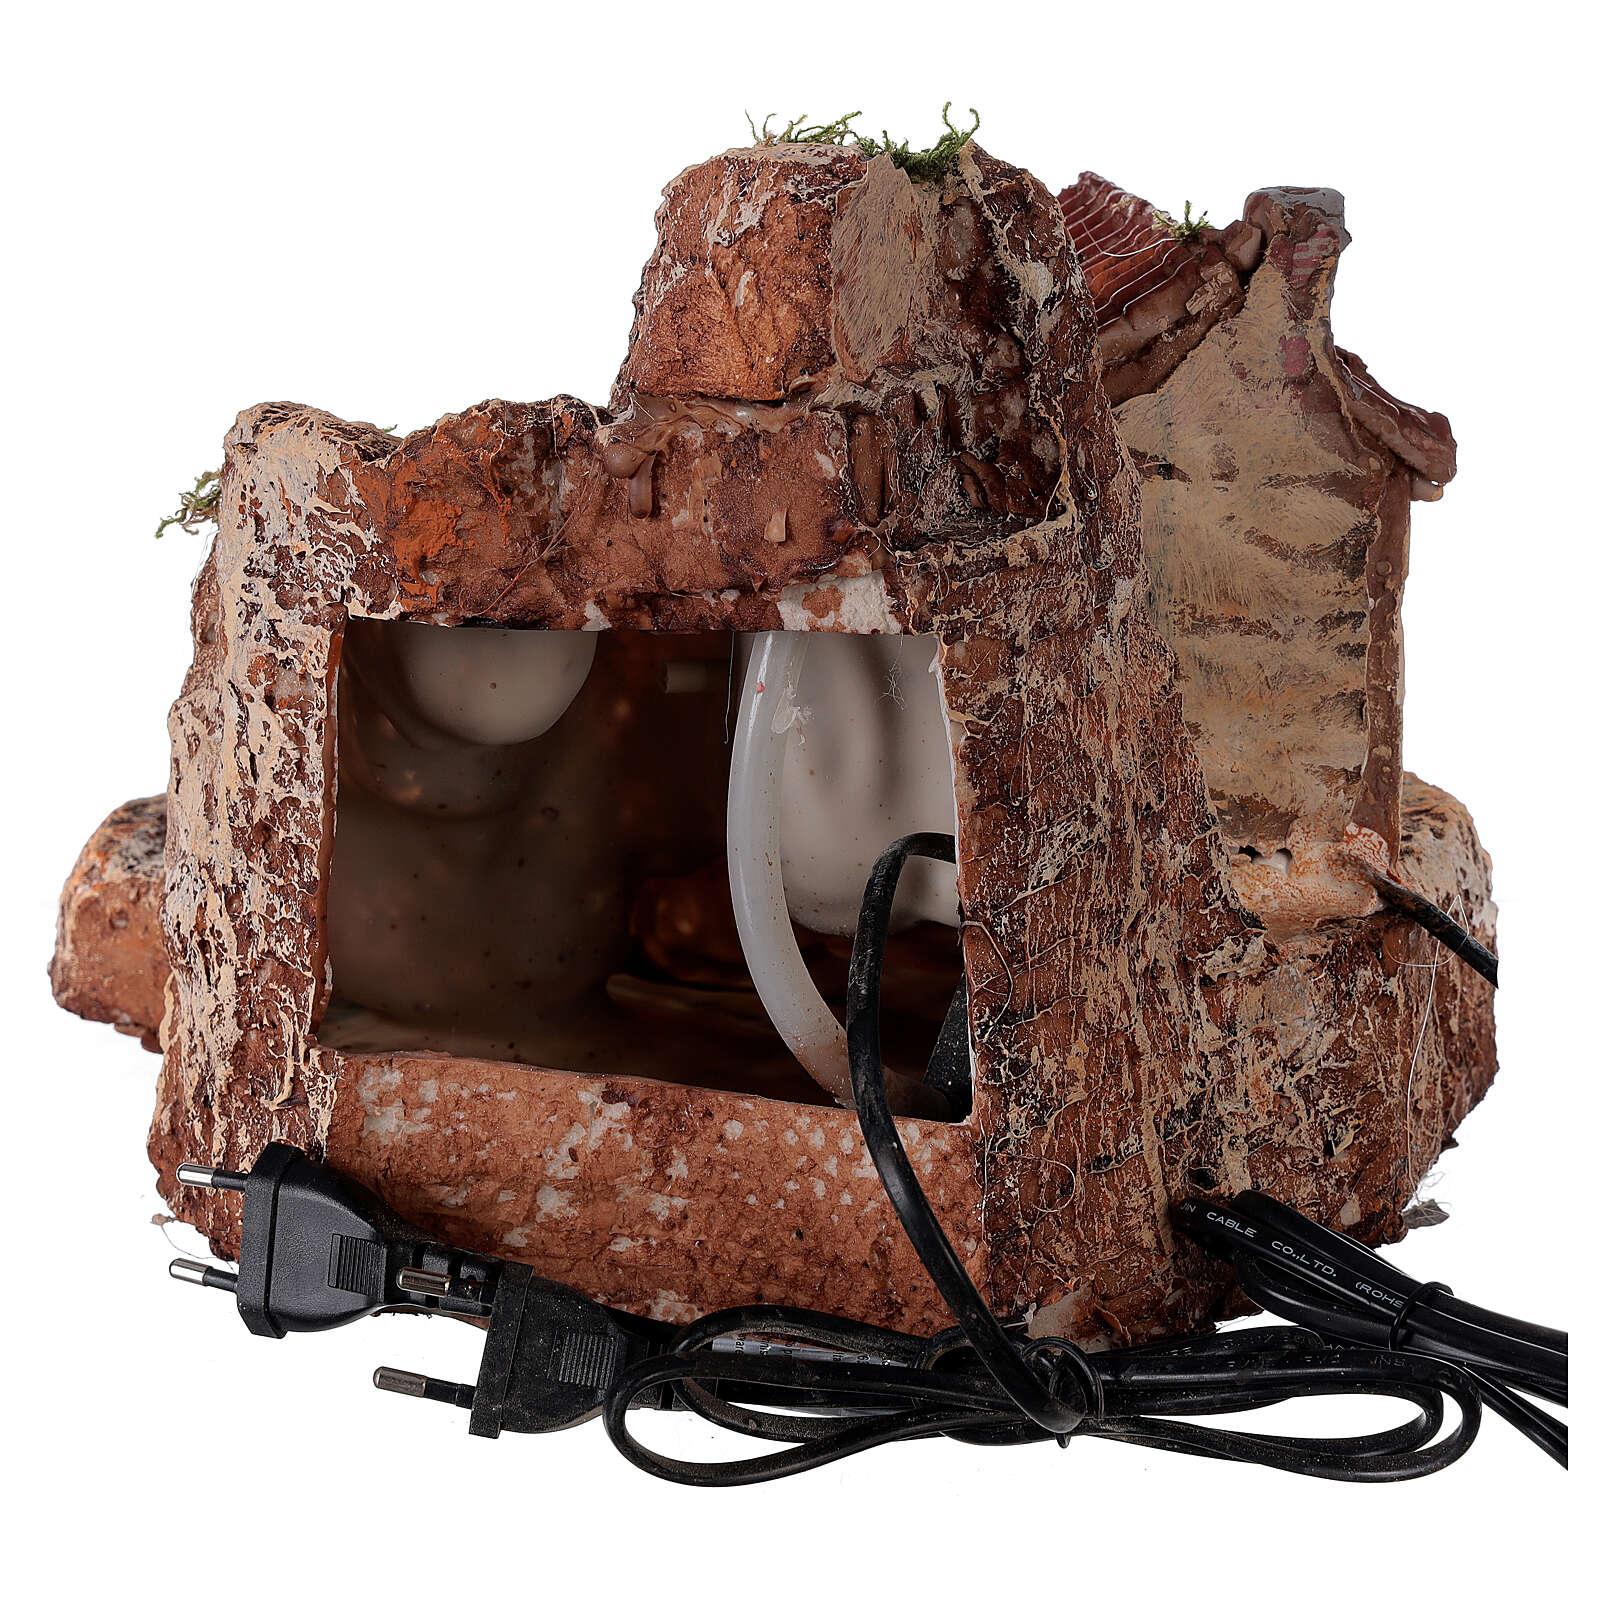 House watermill resin 20x30x30 cm Neapolitan nativity 6-8 cm 4